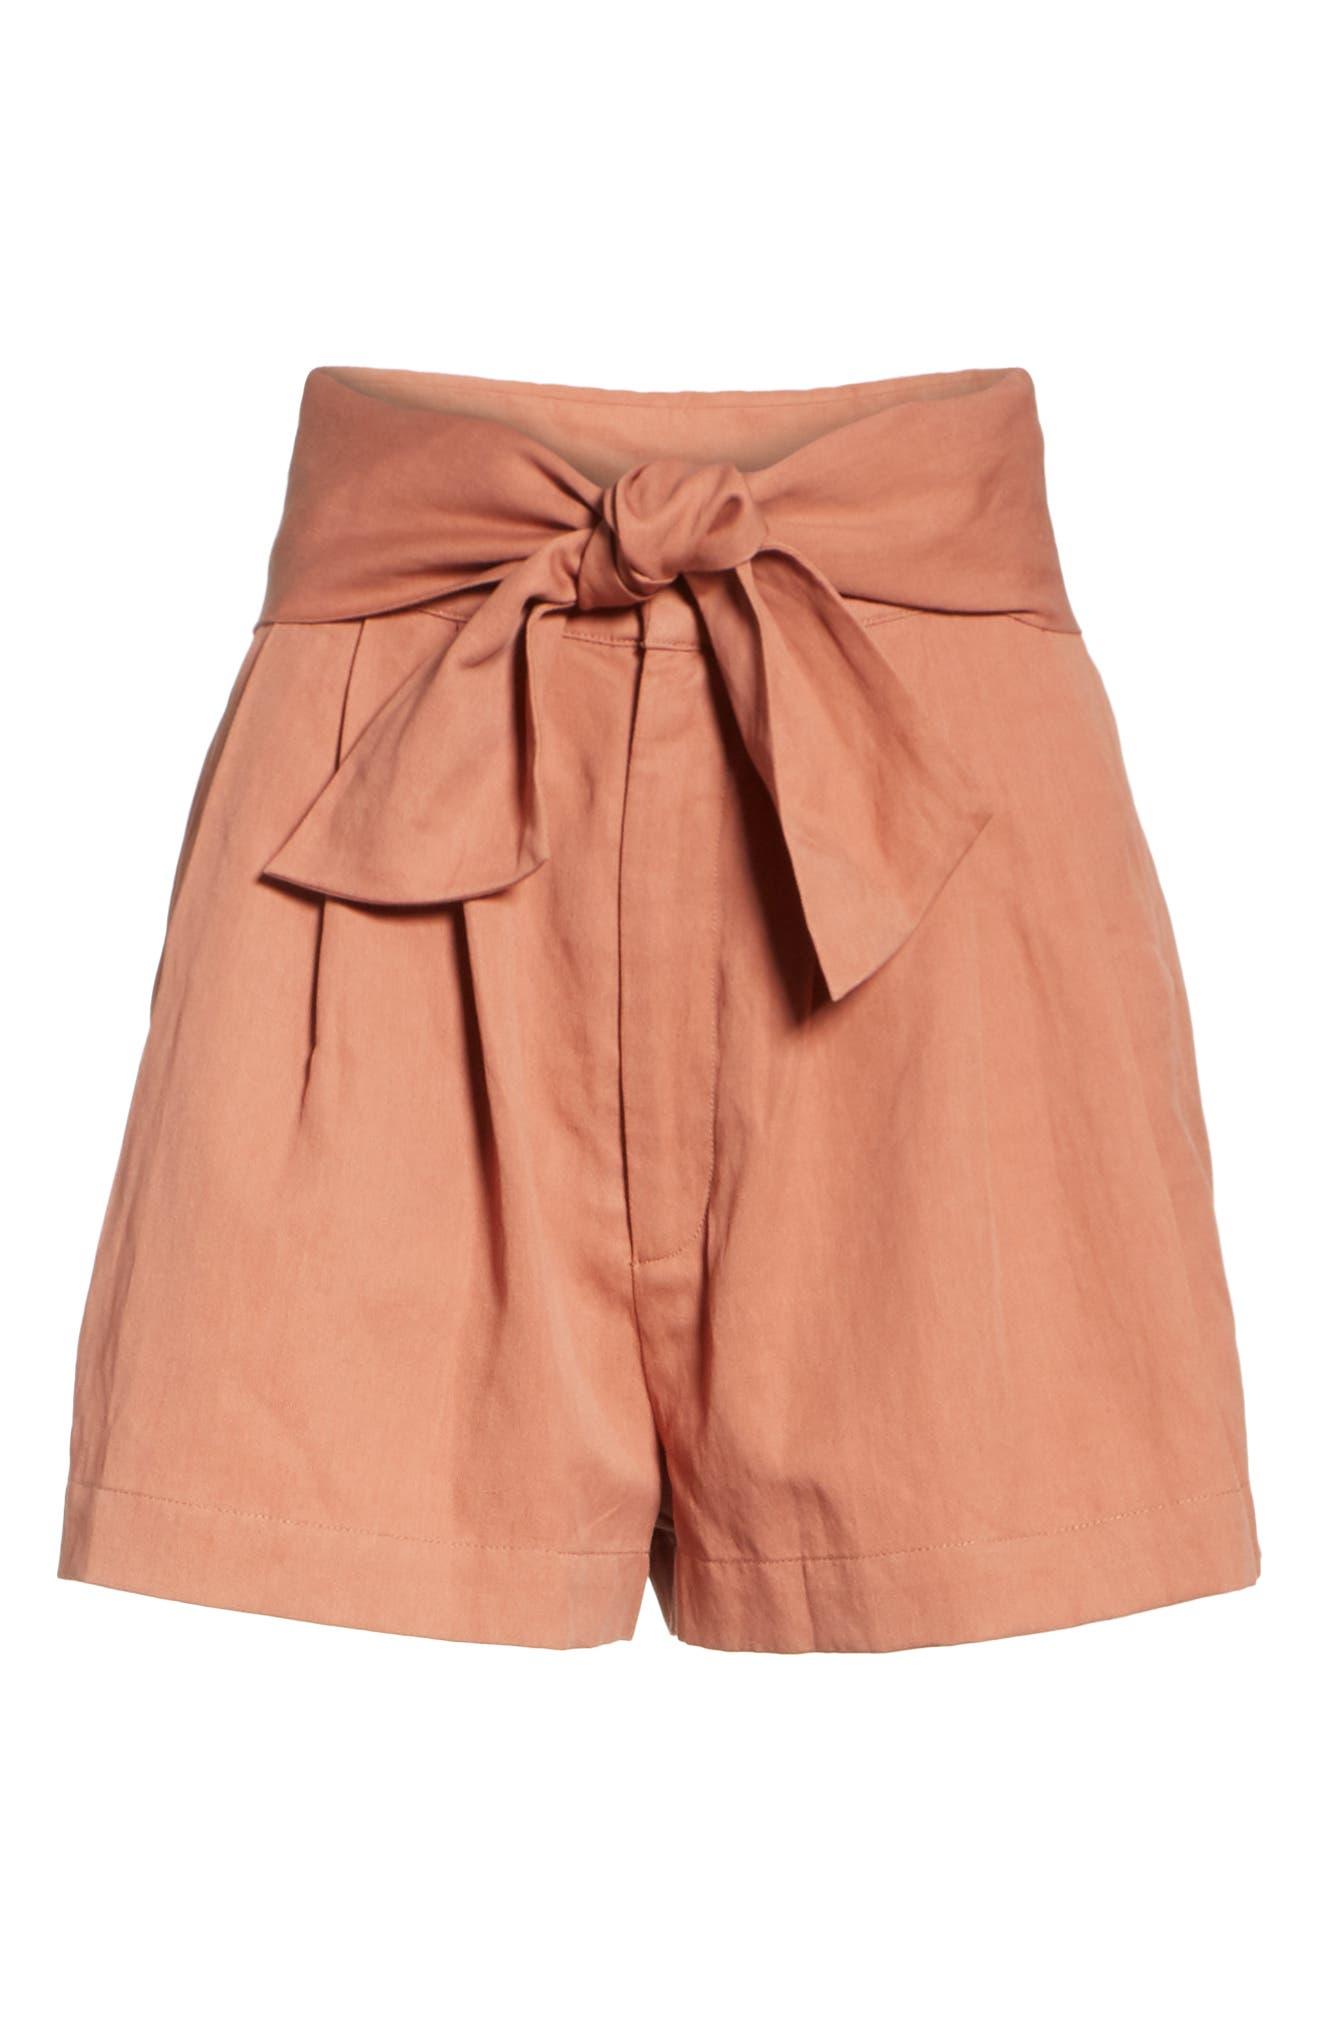 Martim Tie Waist Twill Shorts,                             Alternate thumbnail 6, color,                             200